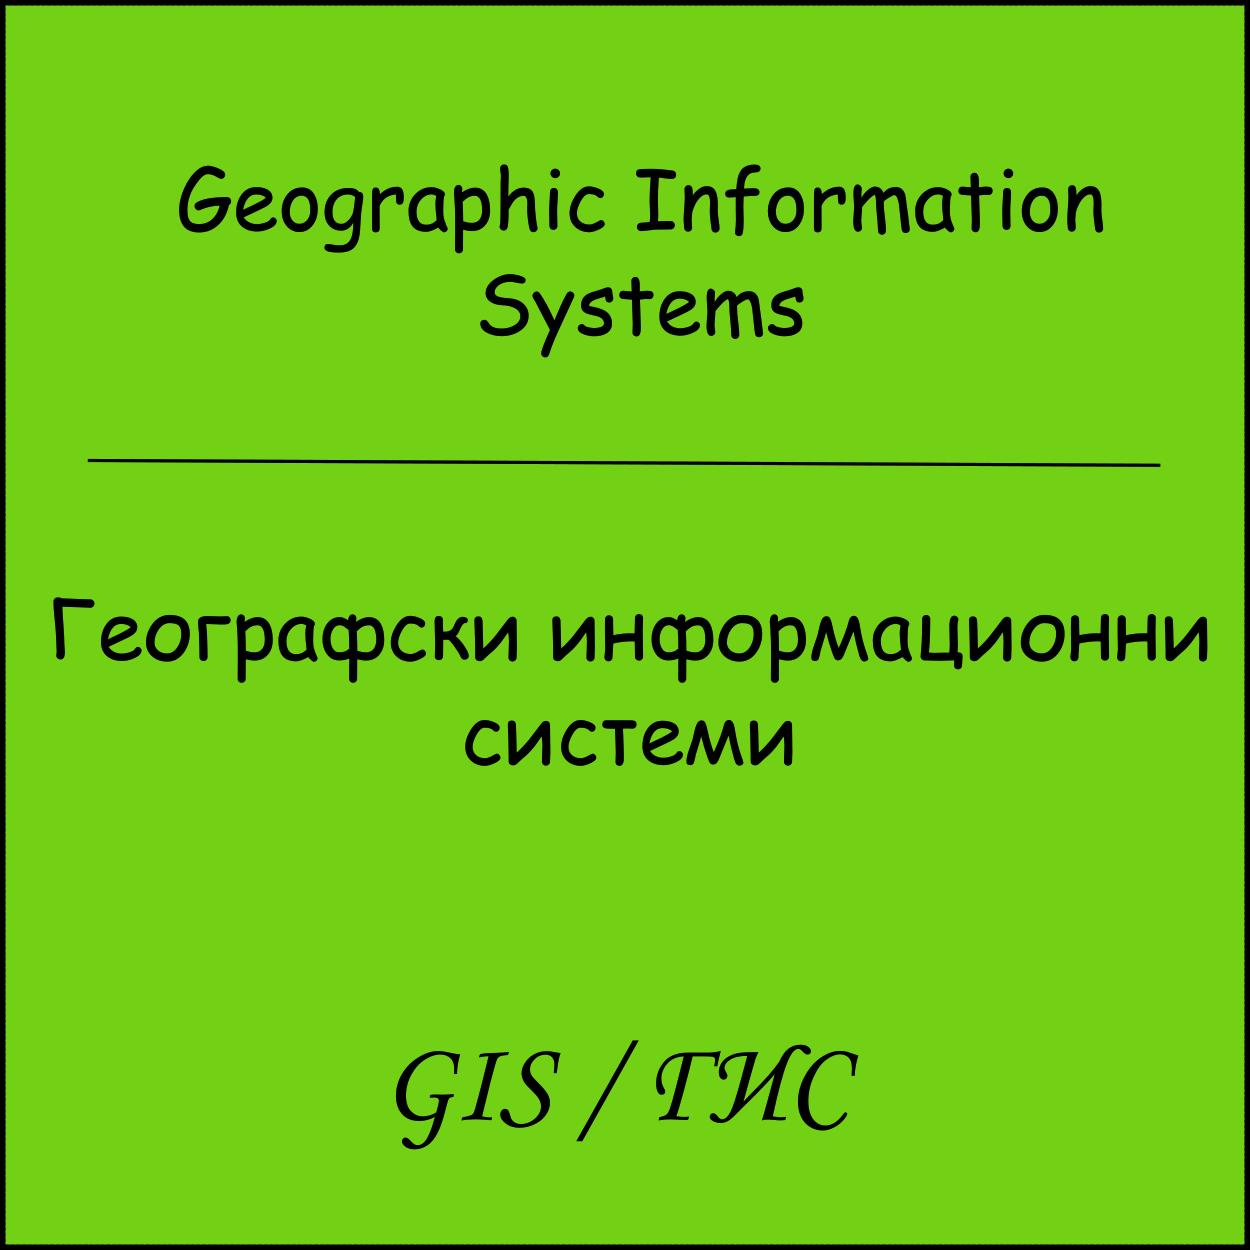 GIS / ГИС